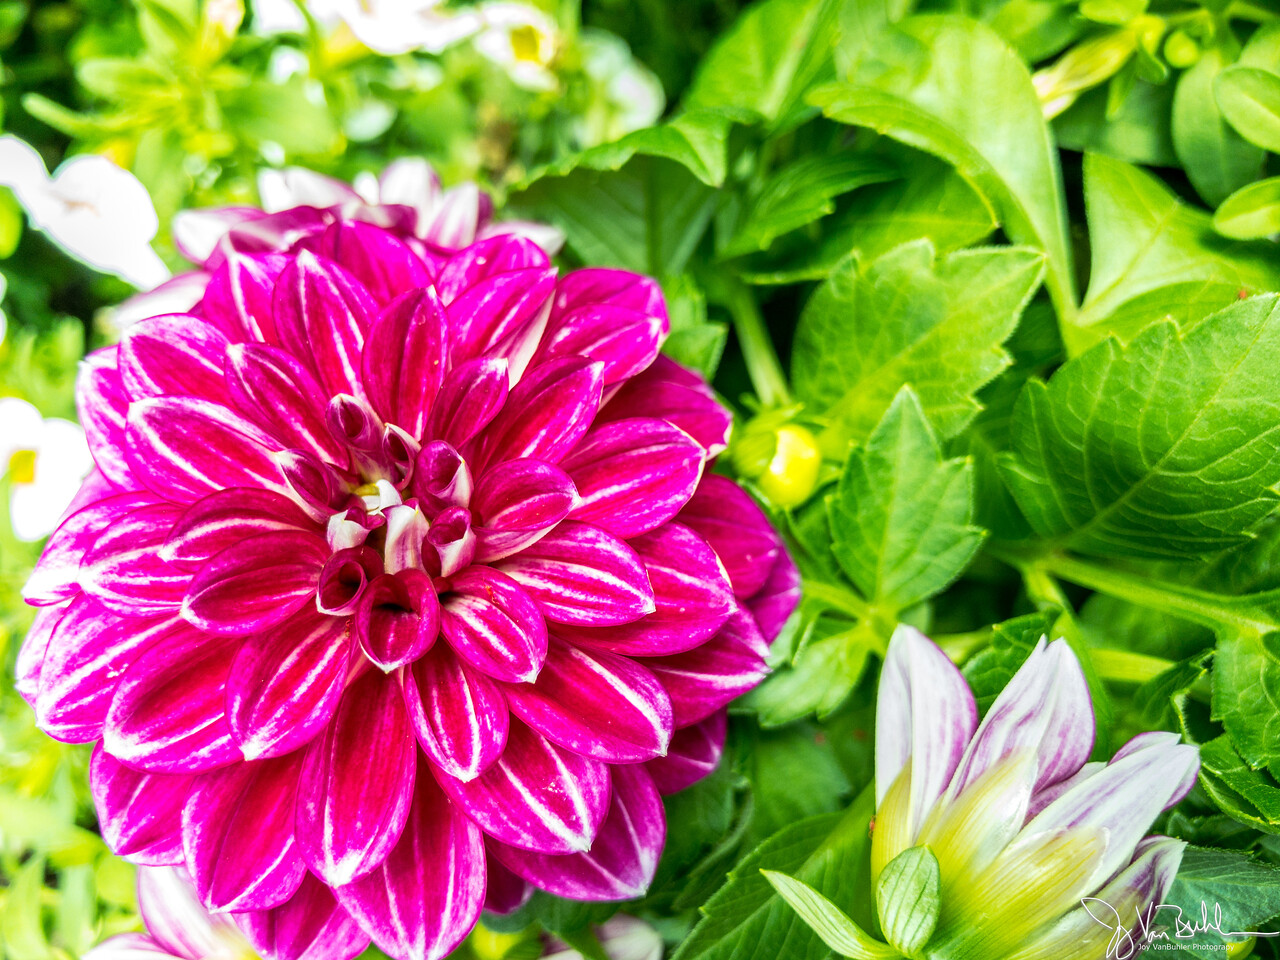 149/365 - Flowers